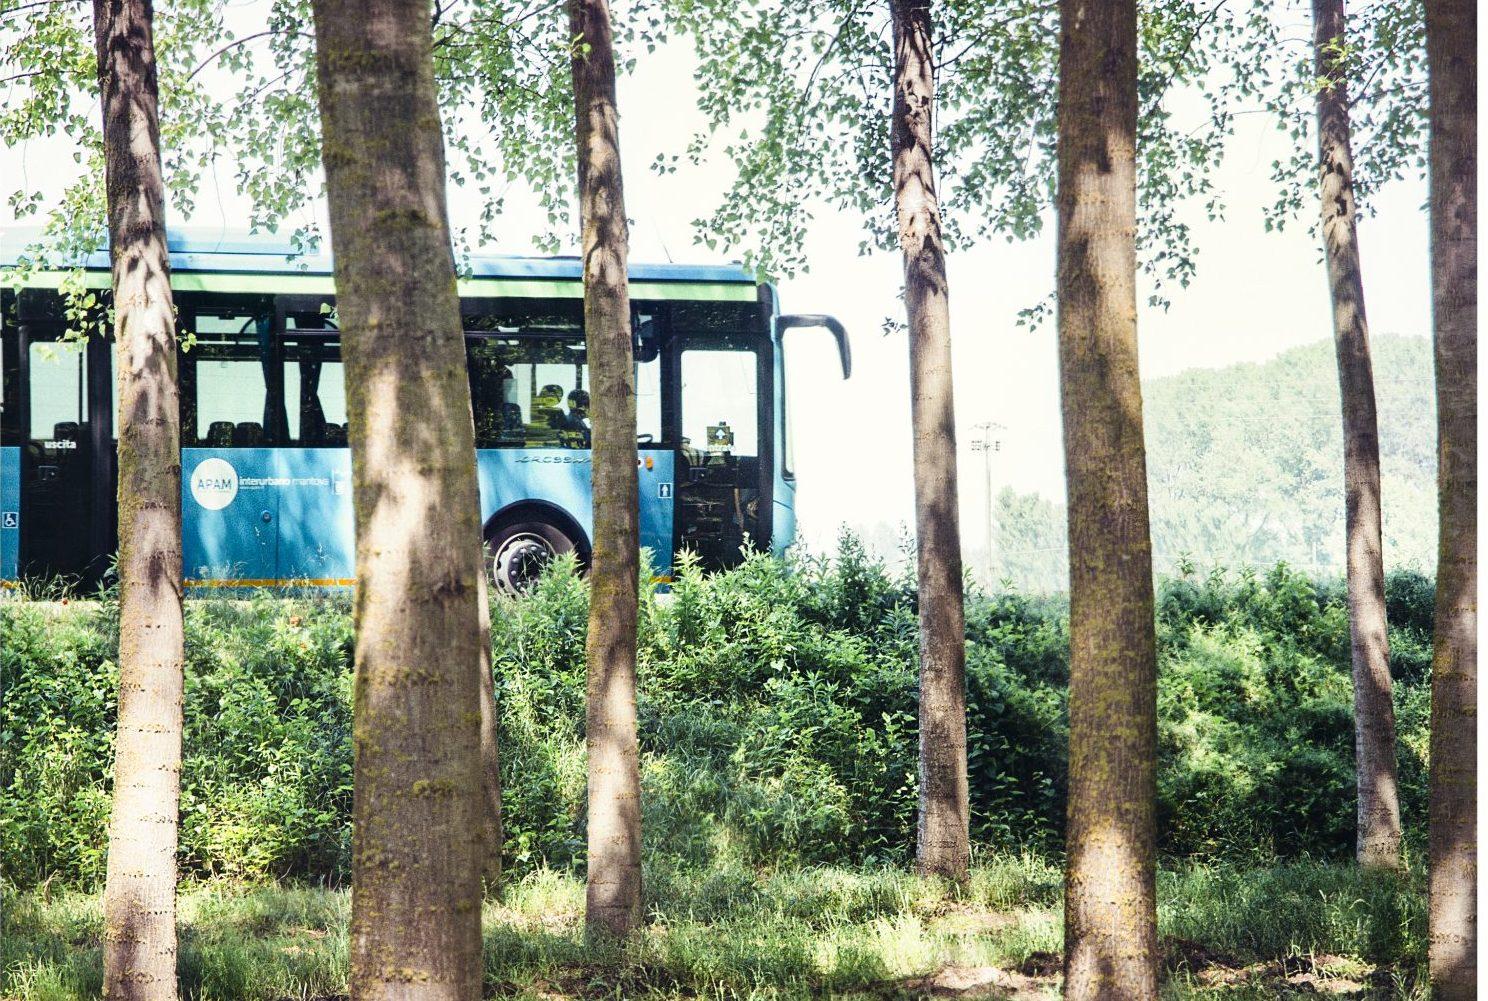 y.share gestione flotte trasporto pubblico